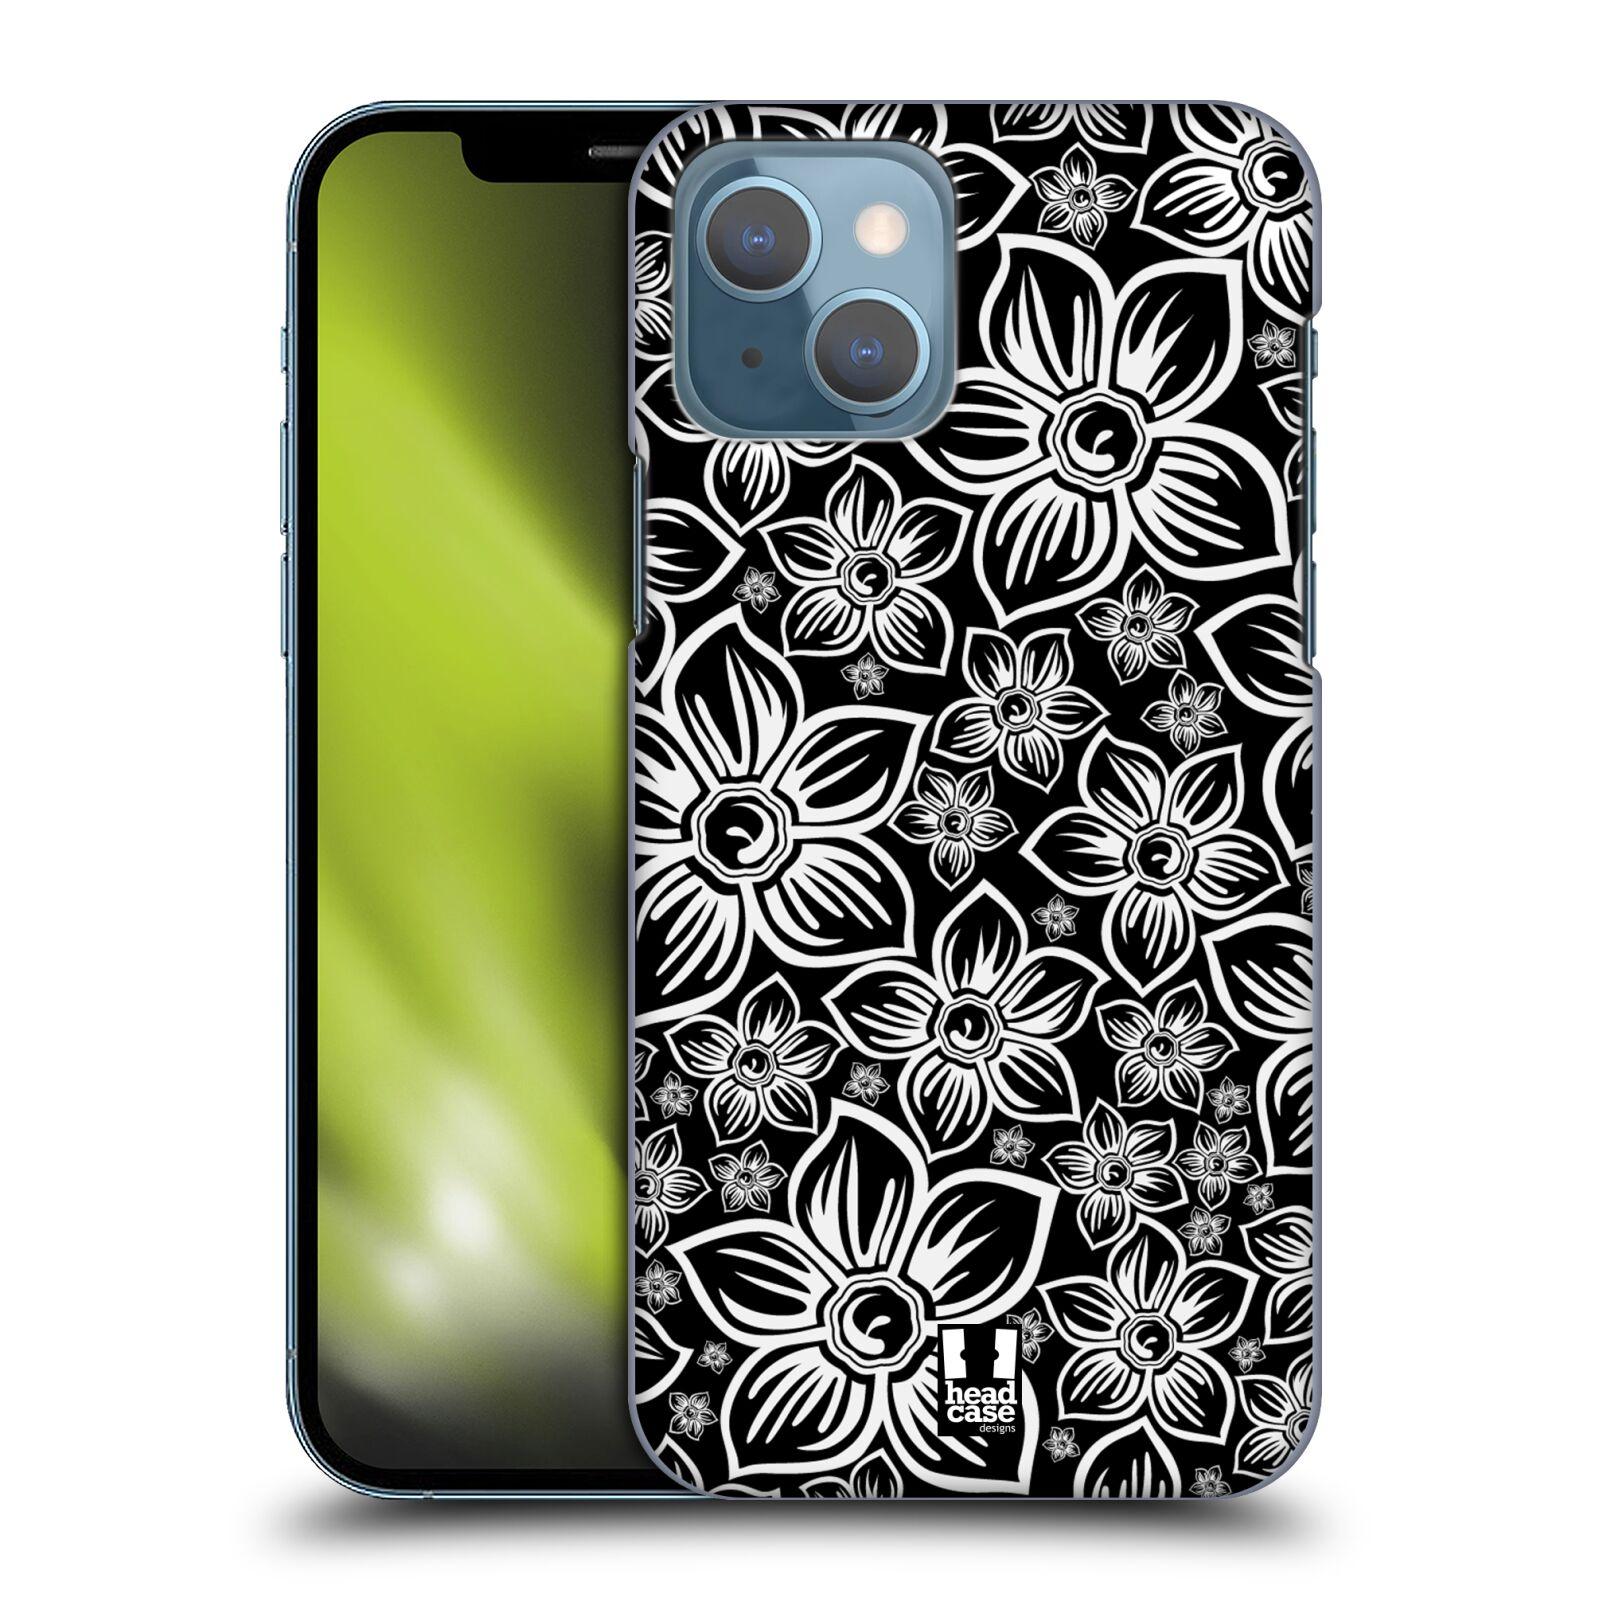 Plastové pouzdro na mobil Apple iPhone 13 - Head Case - FLORAL DAISY